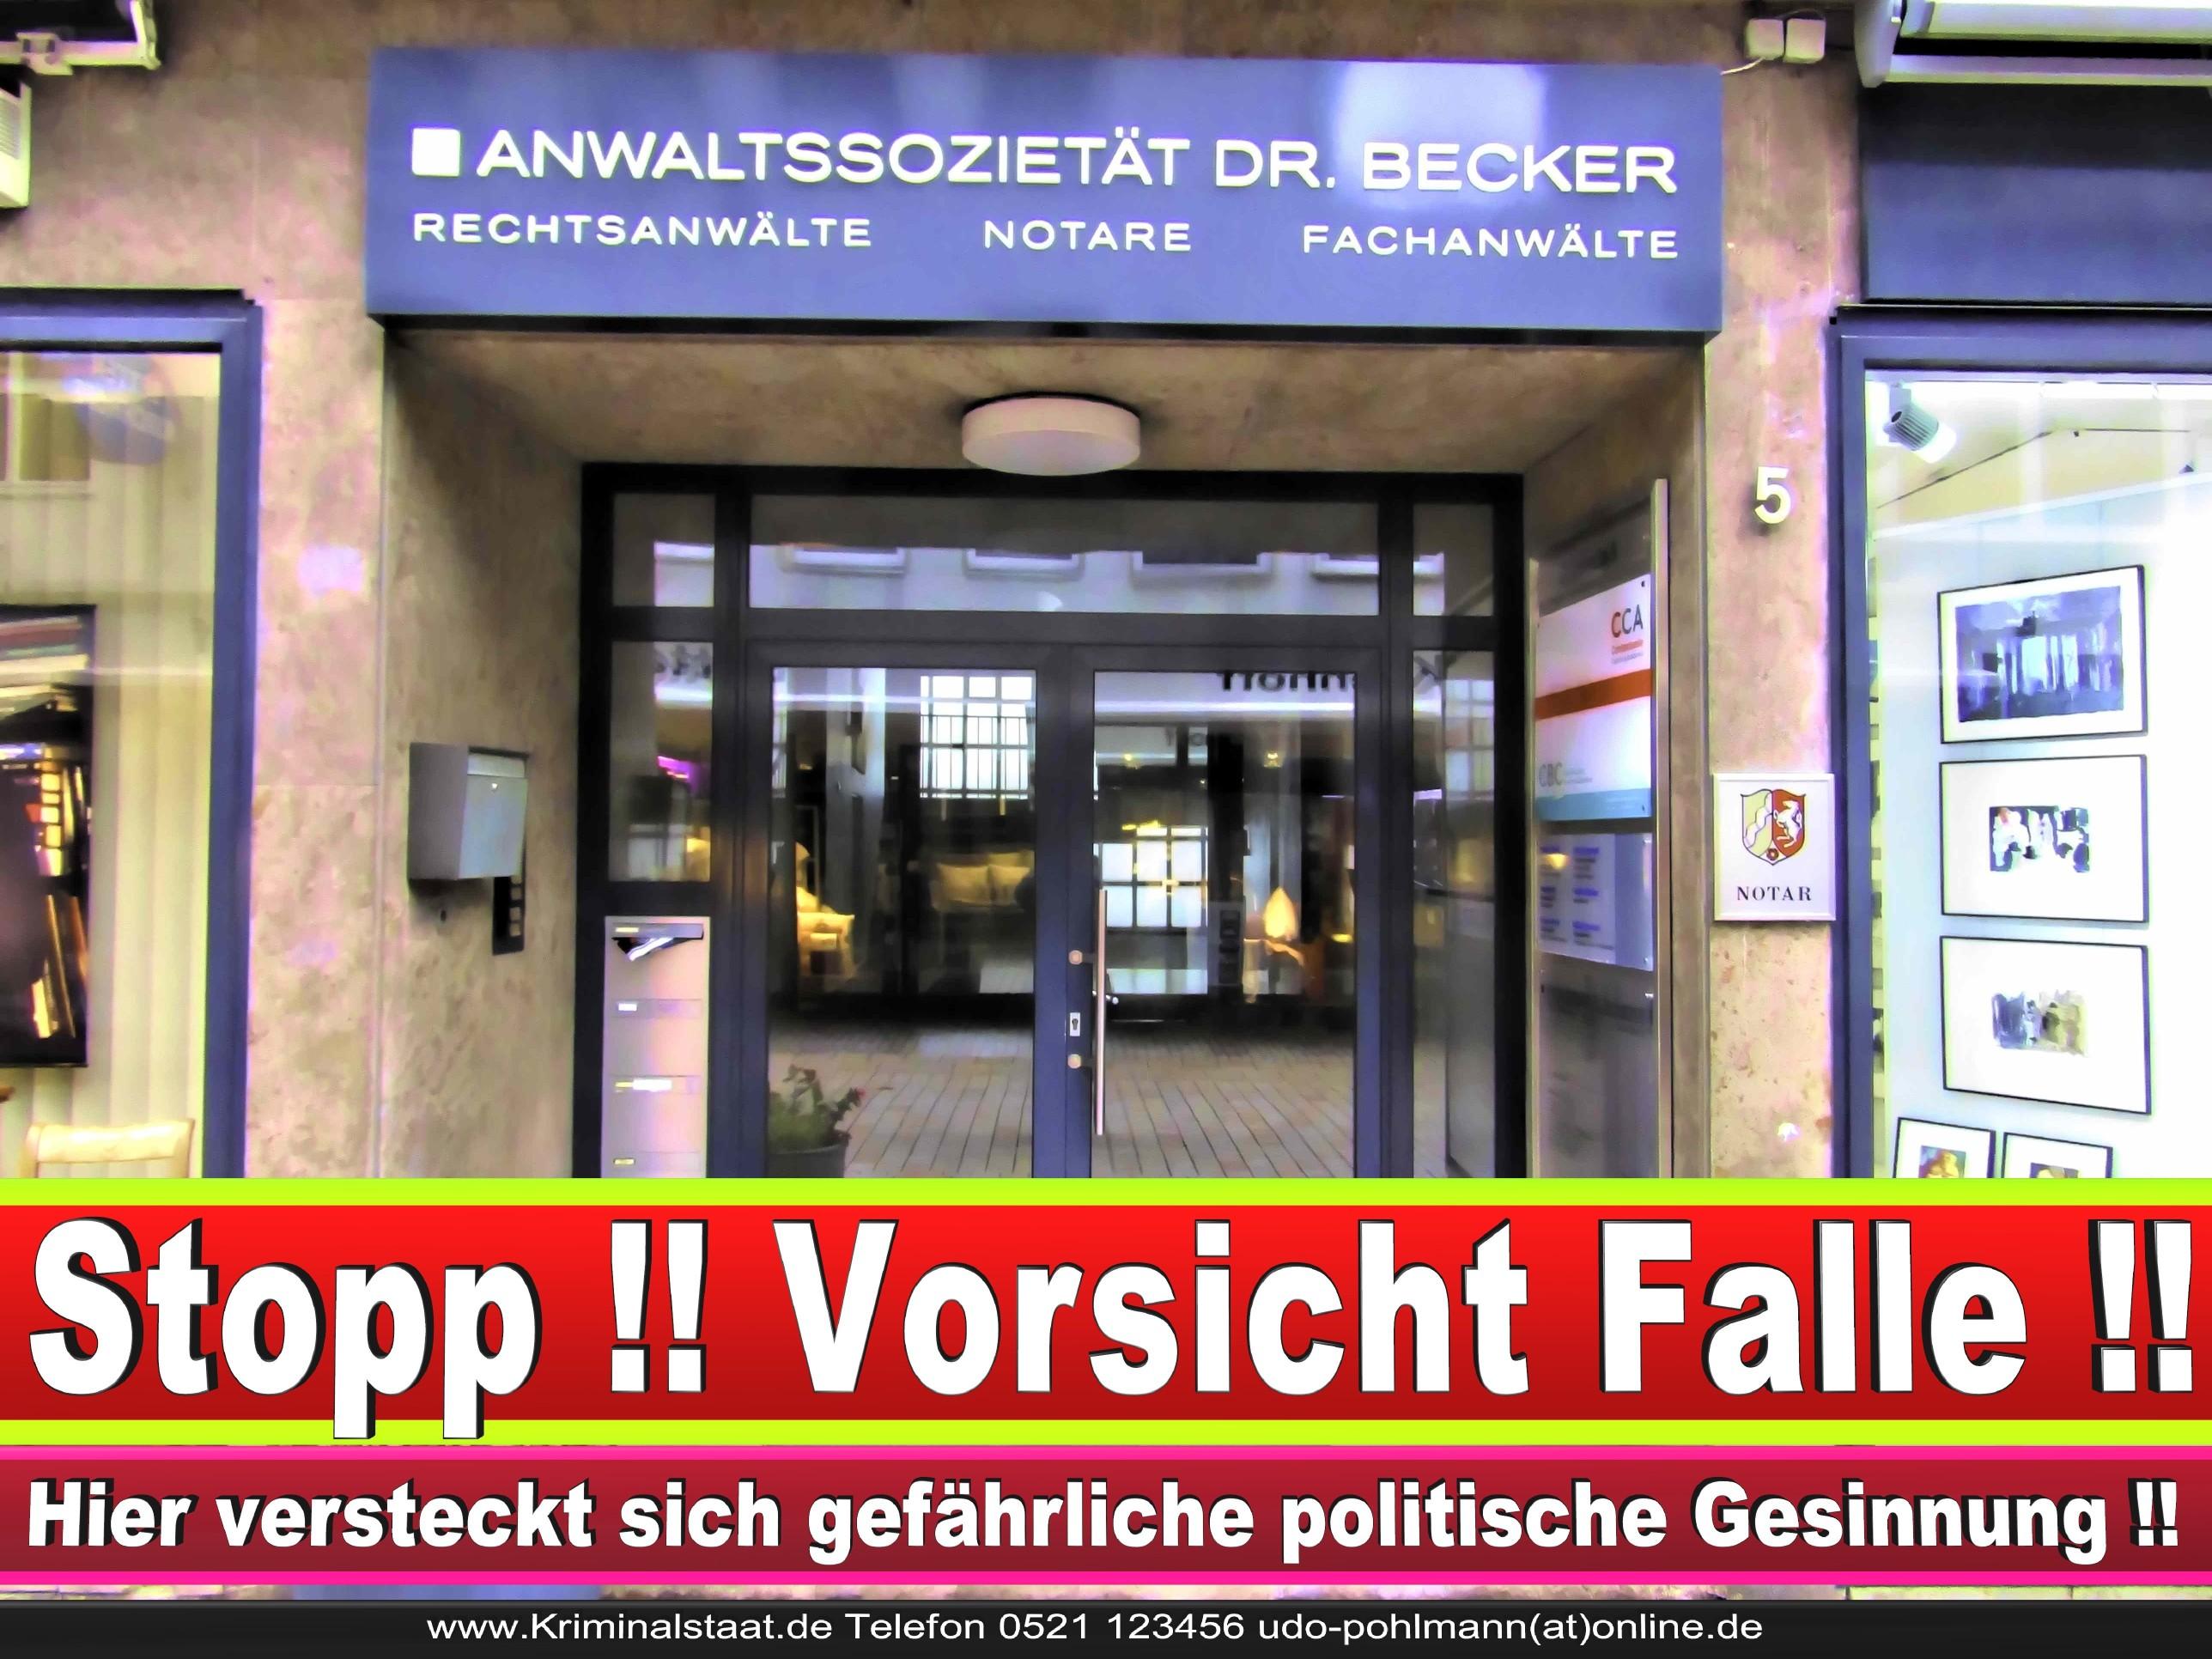 RECHTSANWALT DR THORSTEN FELDMANN CDU BIELEFELD Rechtsanwalt Und Notar A D Werner Kaup LANDTAGSWAHL BUNDESTAGSWA L BÜRGERMEISTER AHL NRW 3